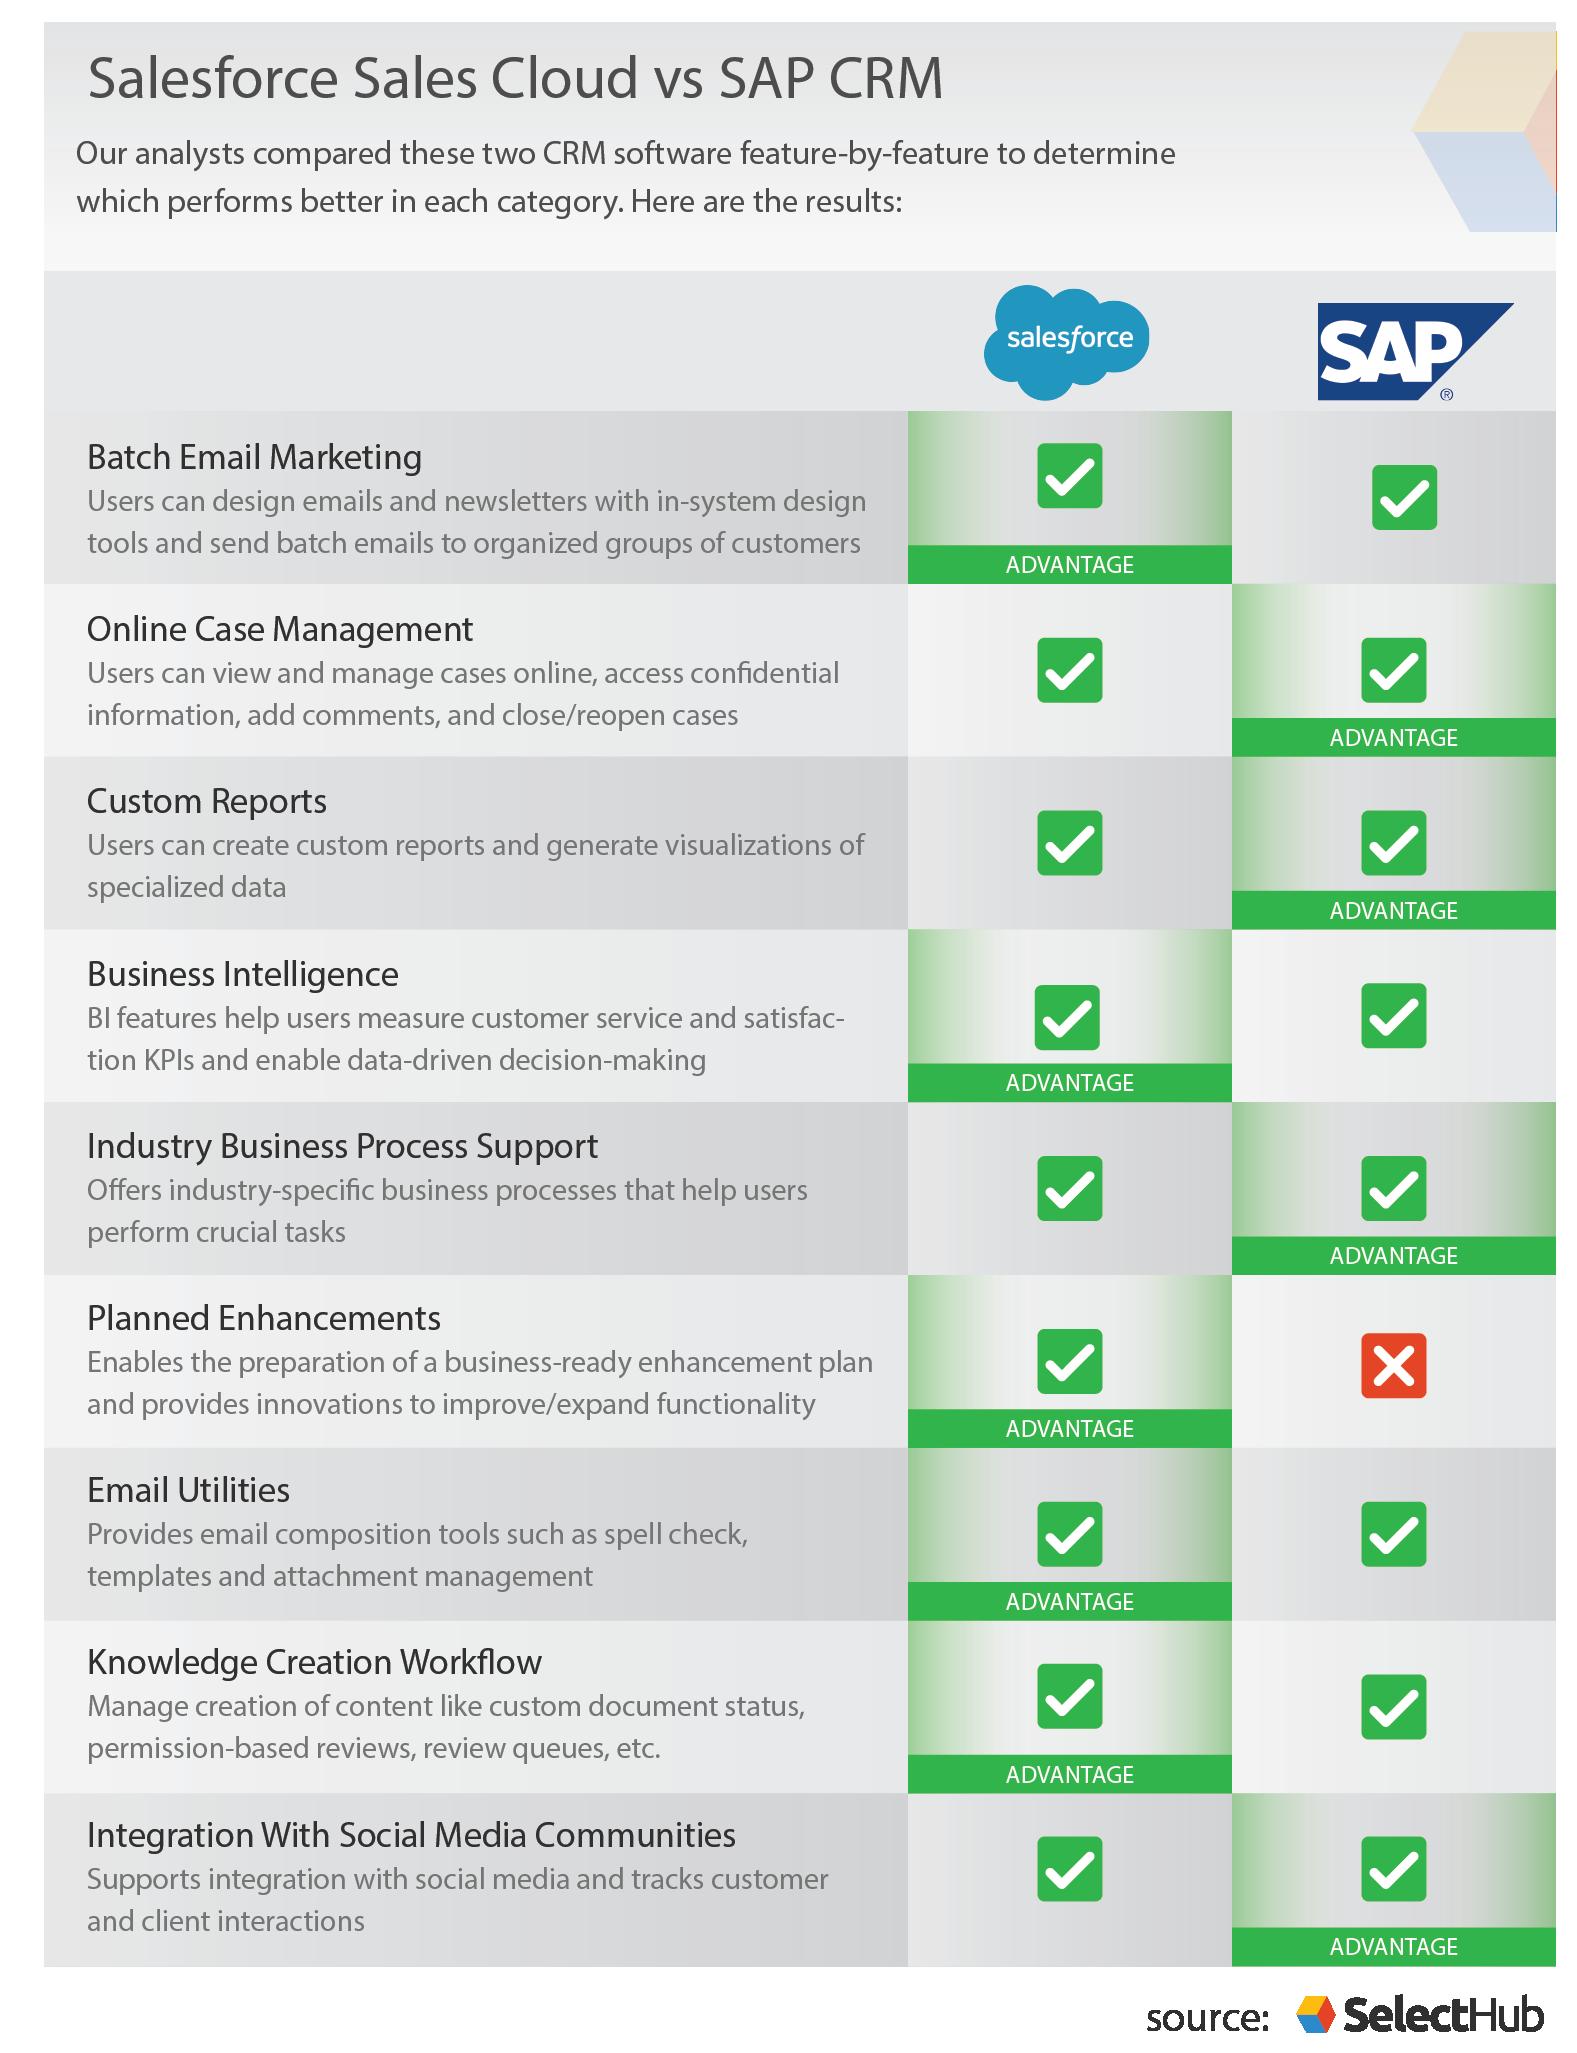 Here's a head to head comparison of SAP versus Salesforce